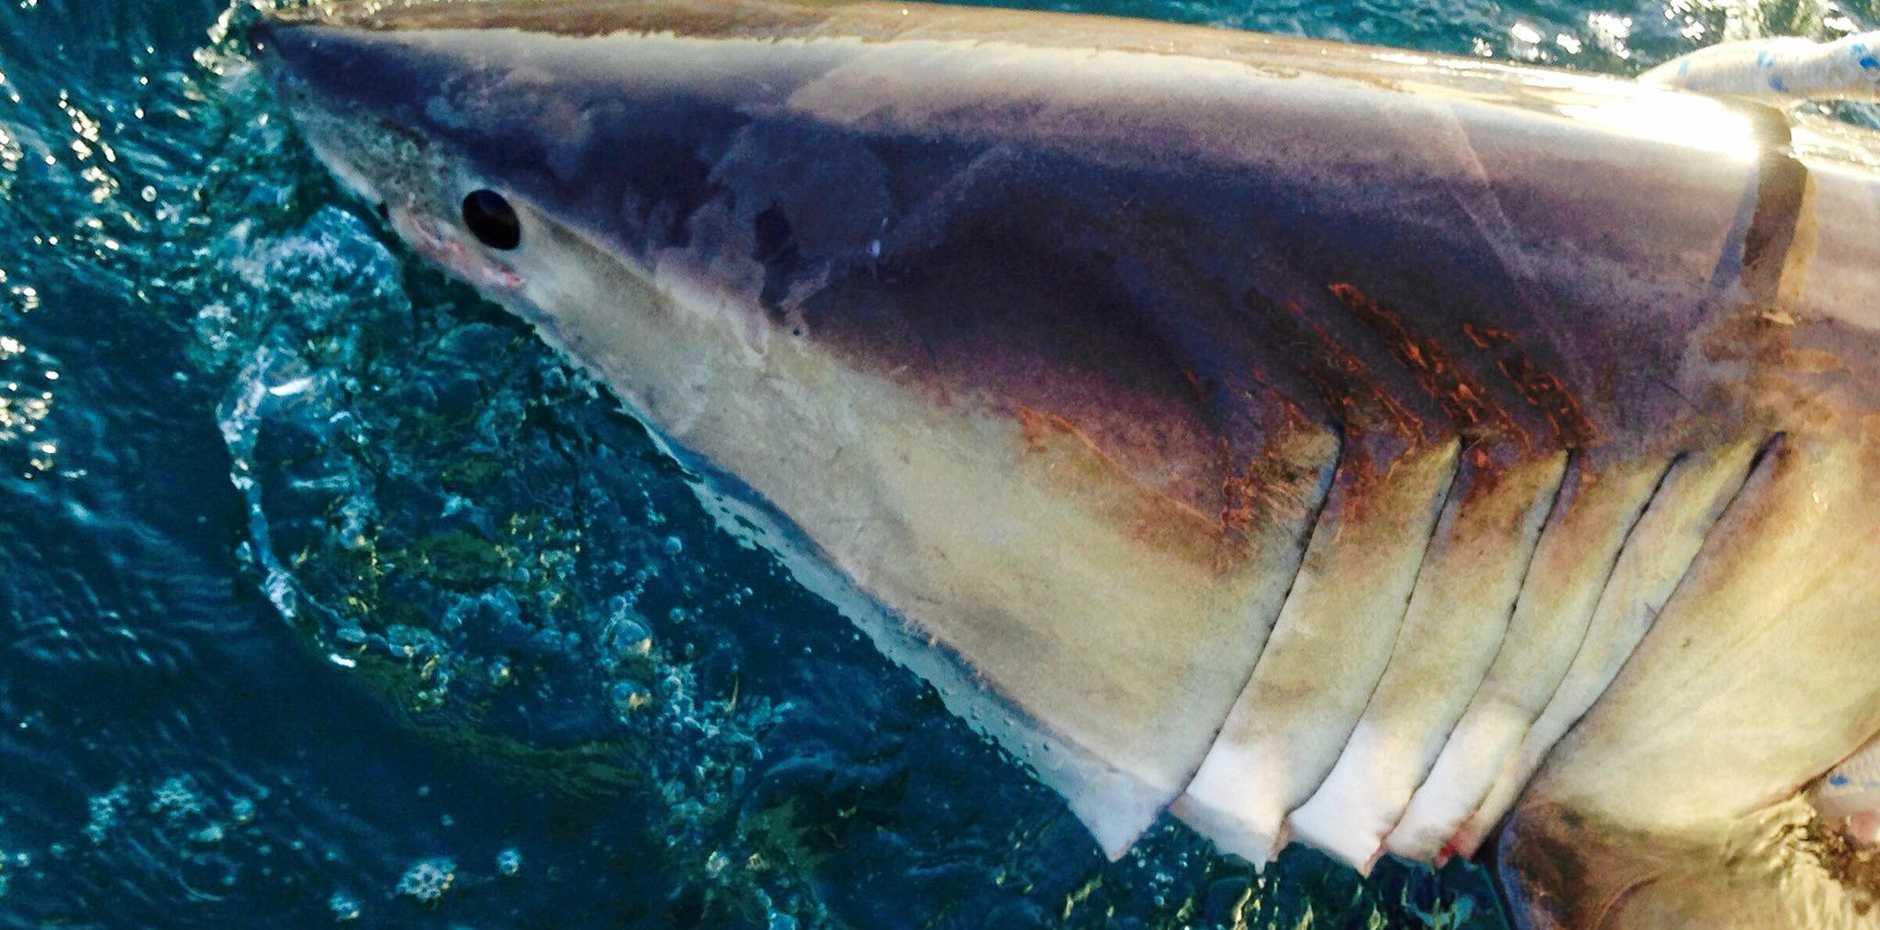 NSWDPI tagging team advise 2.14m female White Shark tagged & release Boambee Beach @ Coffs using SD tech. Shark #36